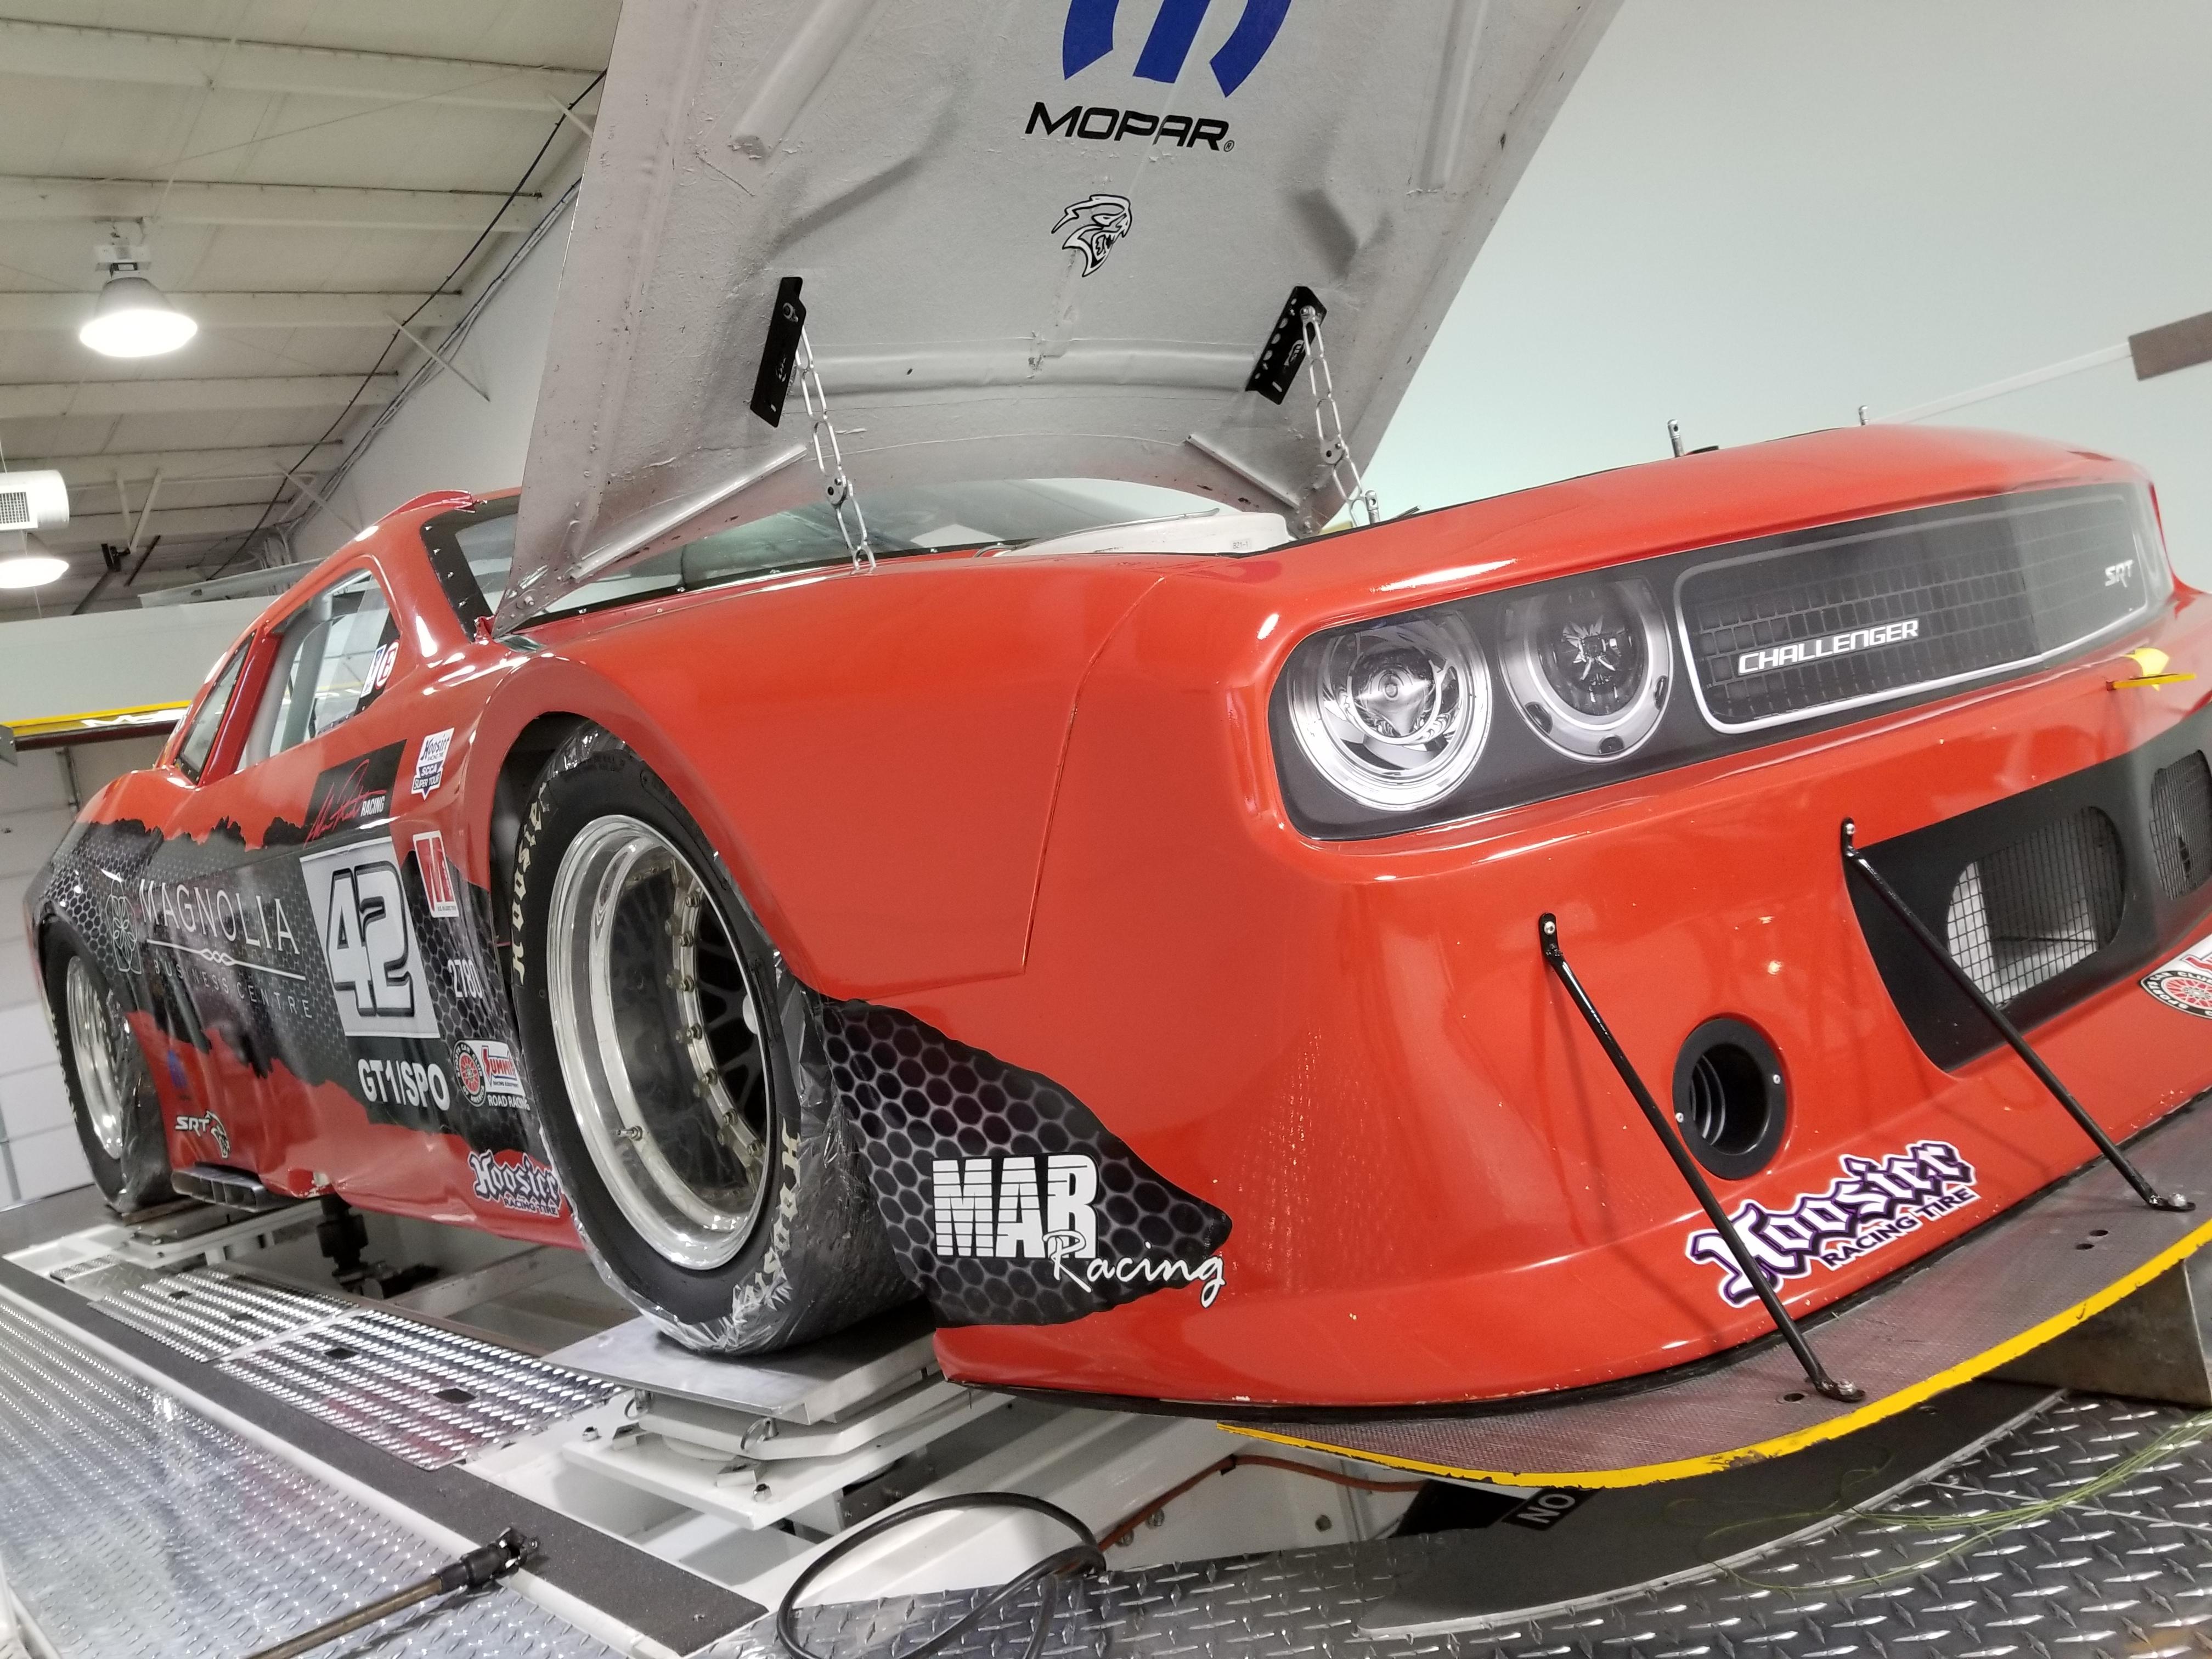 "<font color=""black ""><strong>Motorsports Wiring"